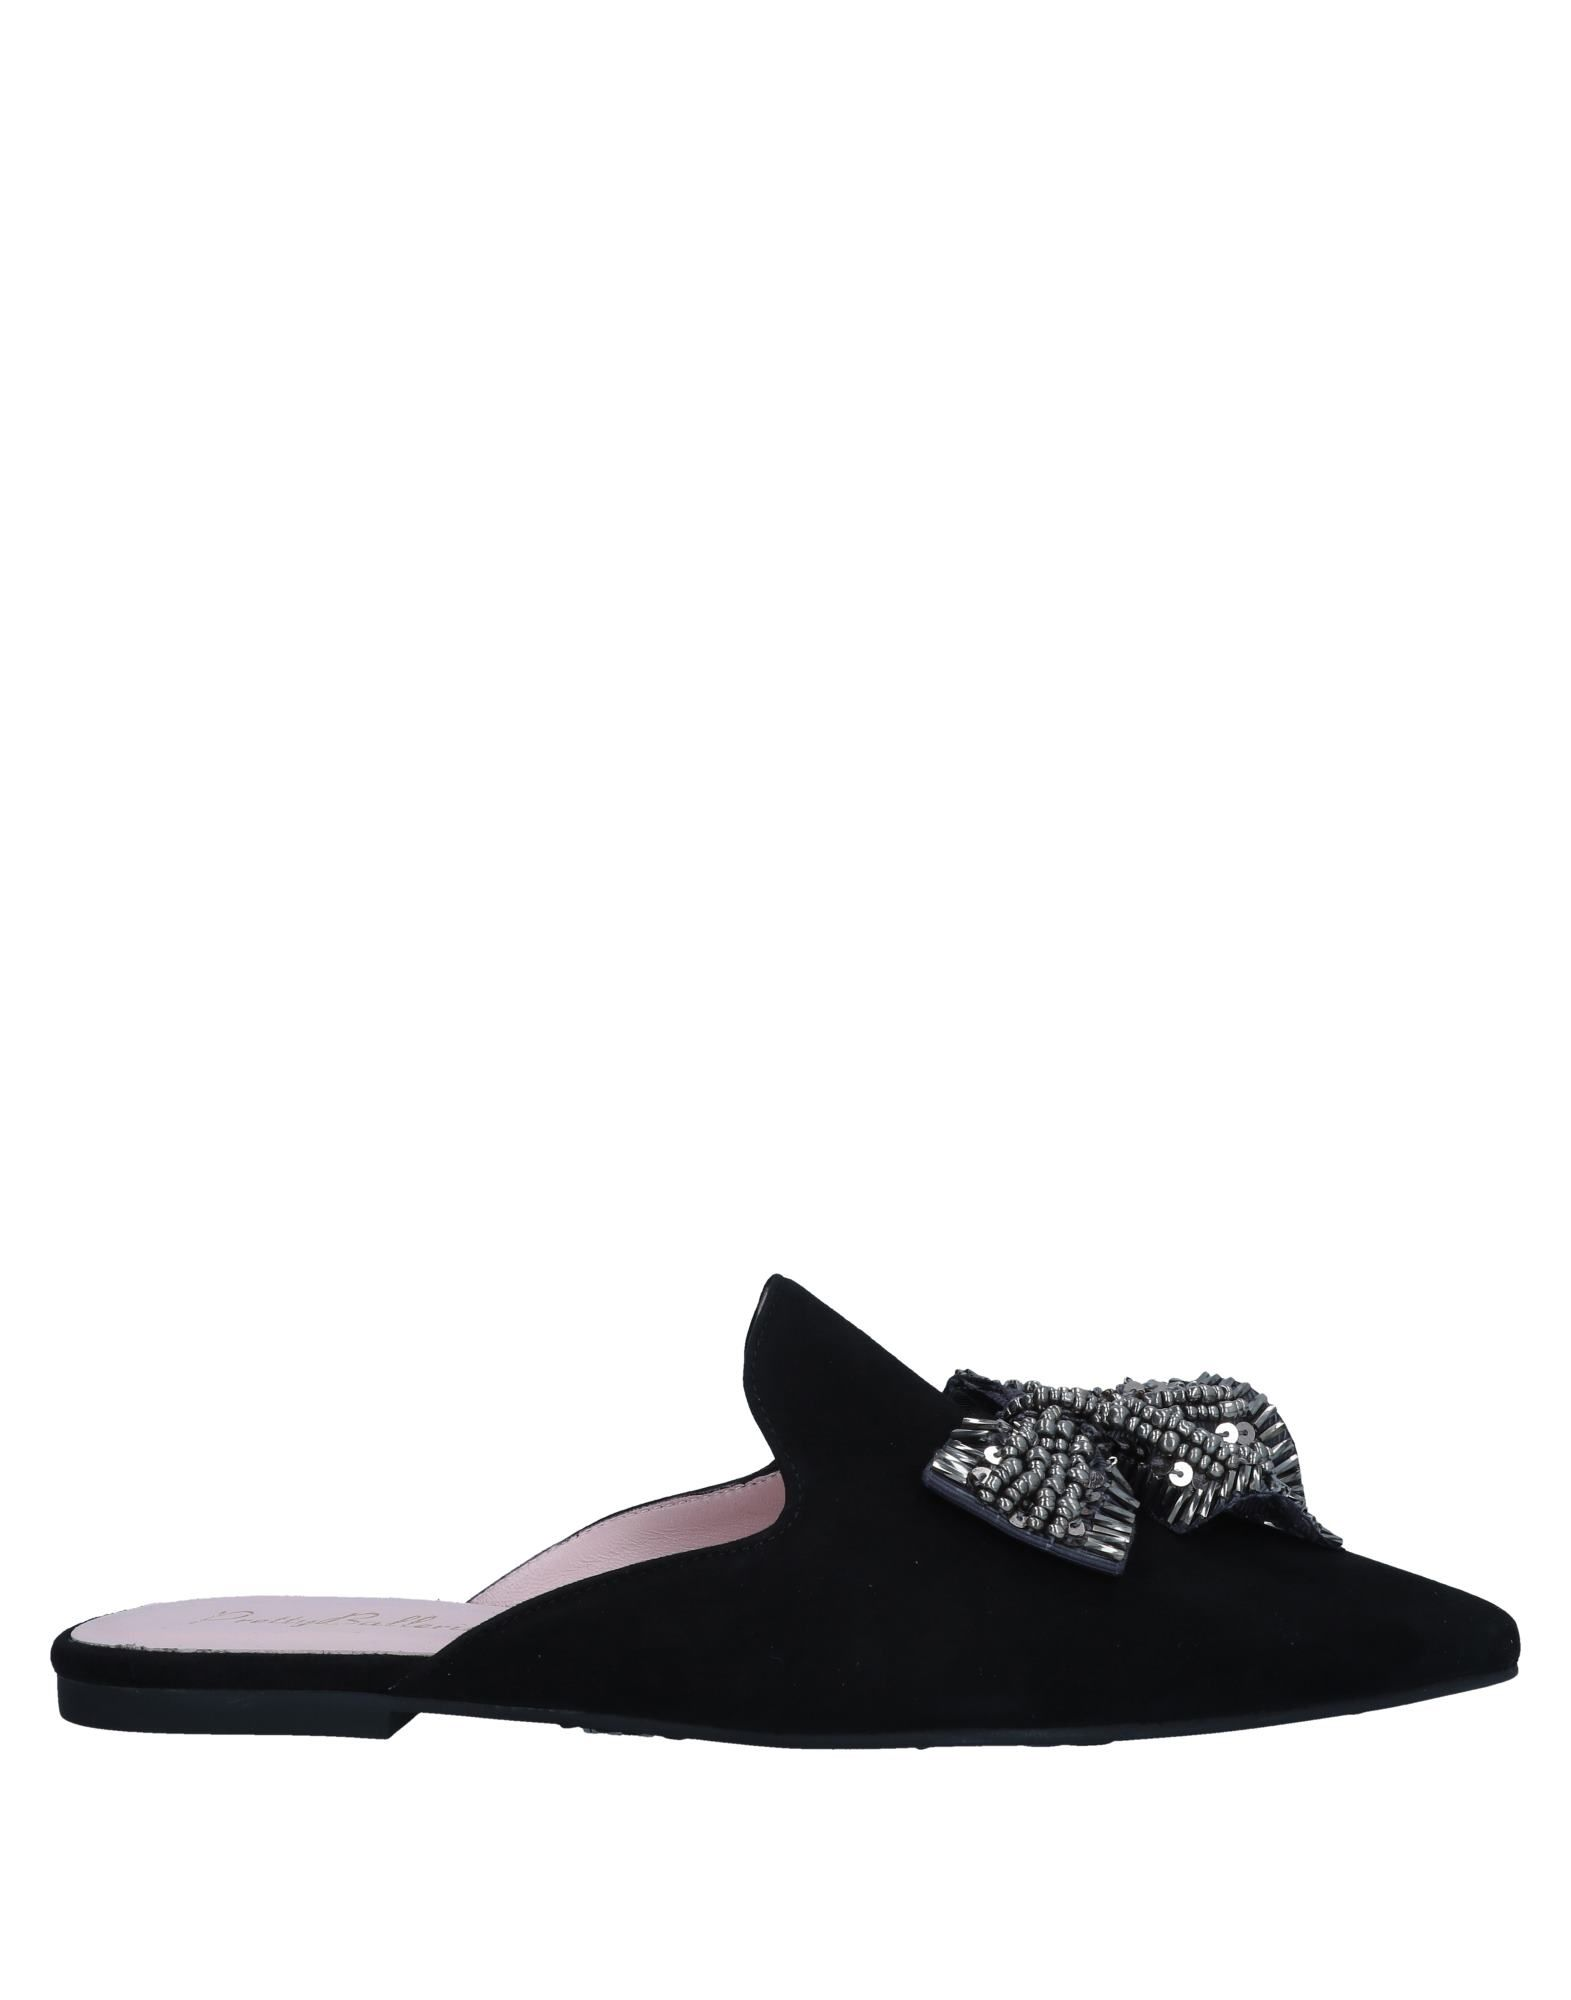 Rabatt Schuhe Pretty Ballerinas Pantoletten Damen  11544648JW